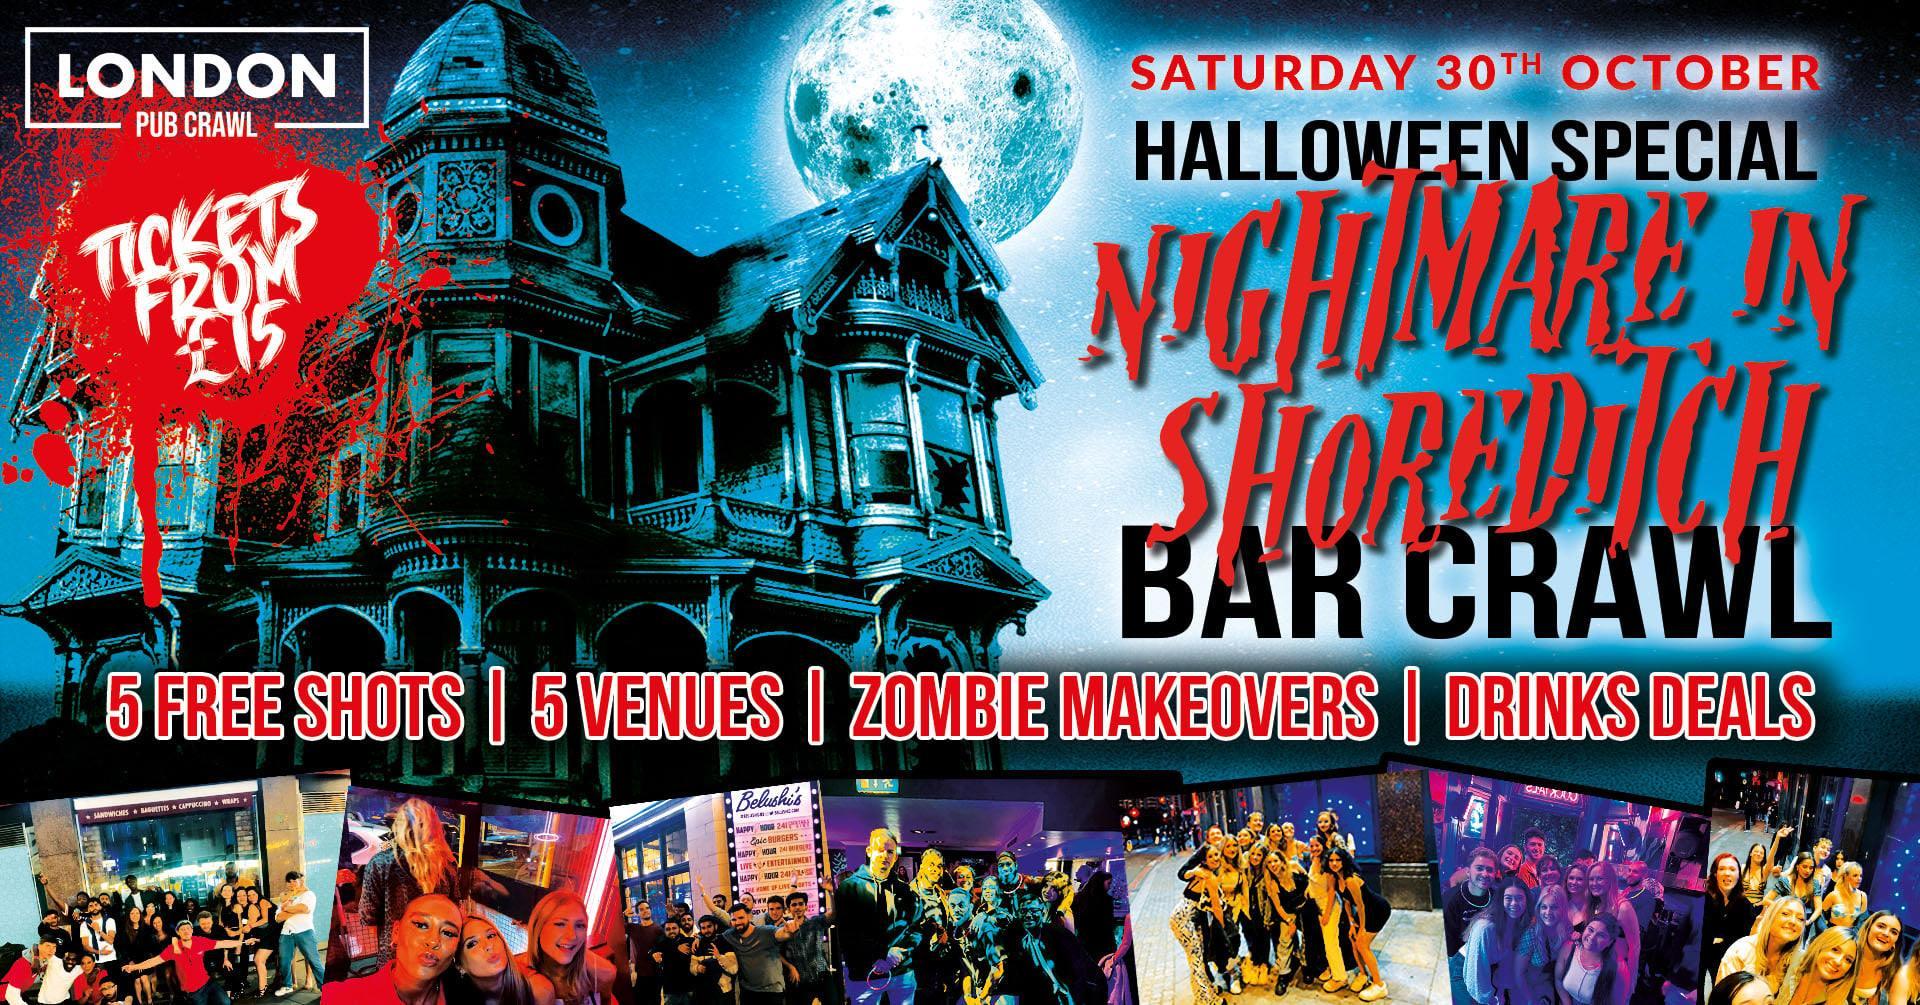 Nightmare in Shoreditch // London's Biggest Halloween Bar Crawl // Free Shots + Drink Deals